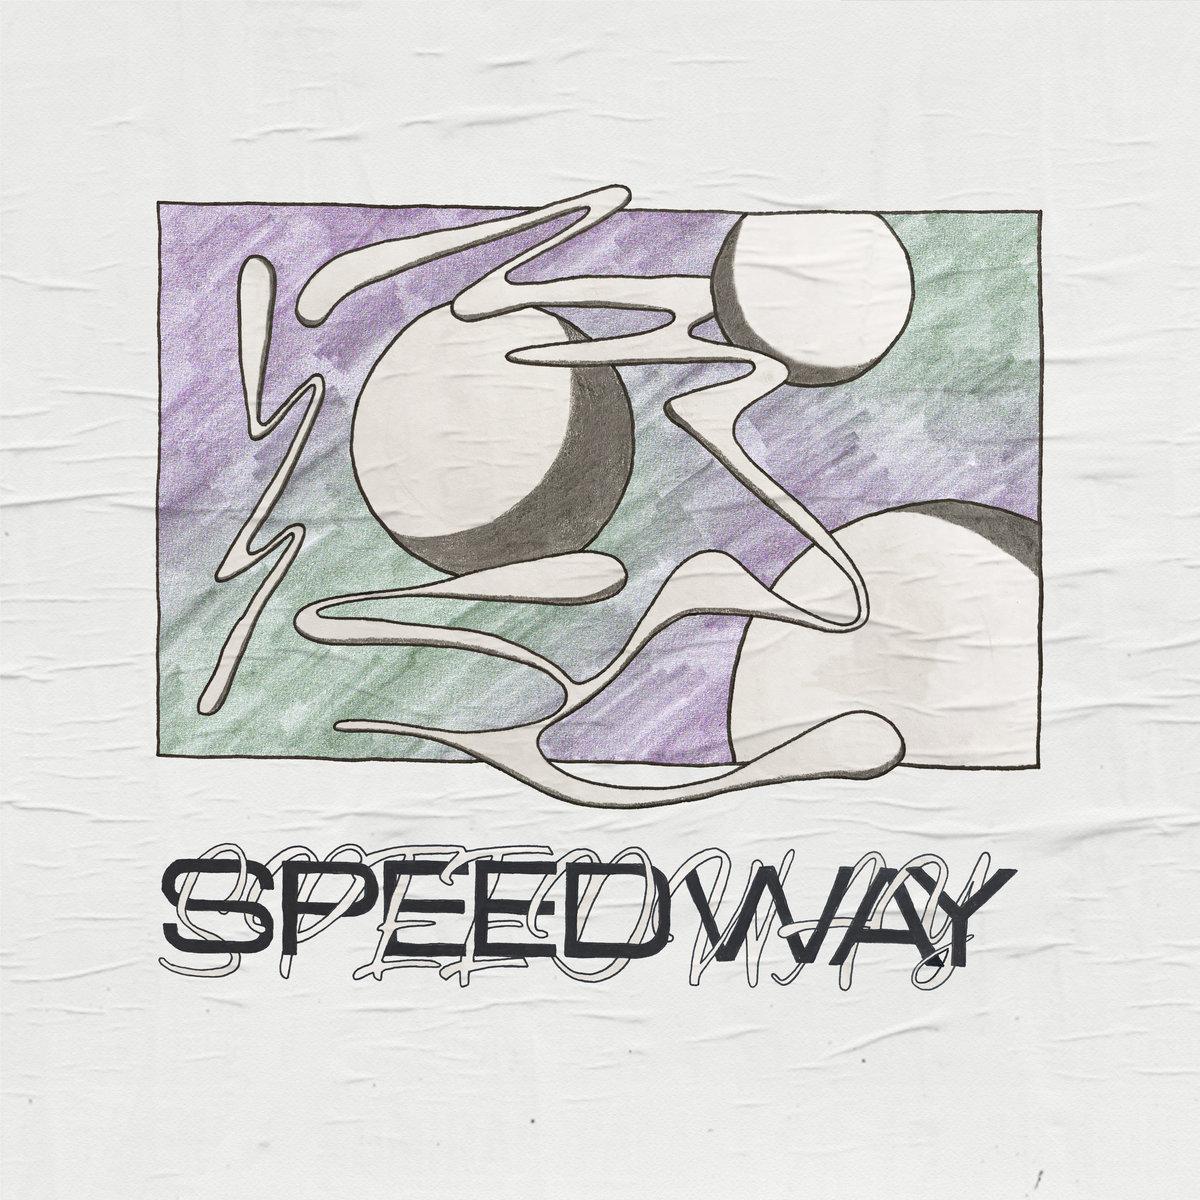 Speedway - S/T 7'' - Triple B Records / Svenks Hardcorekultur